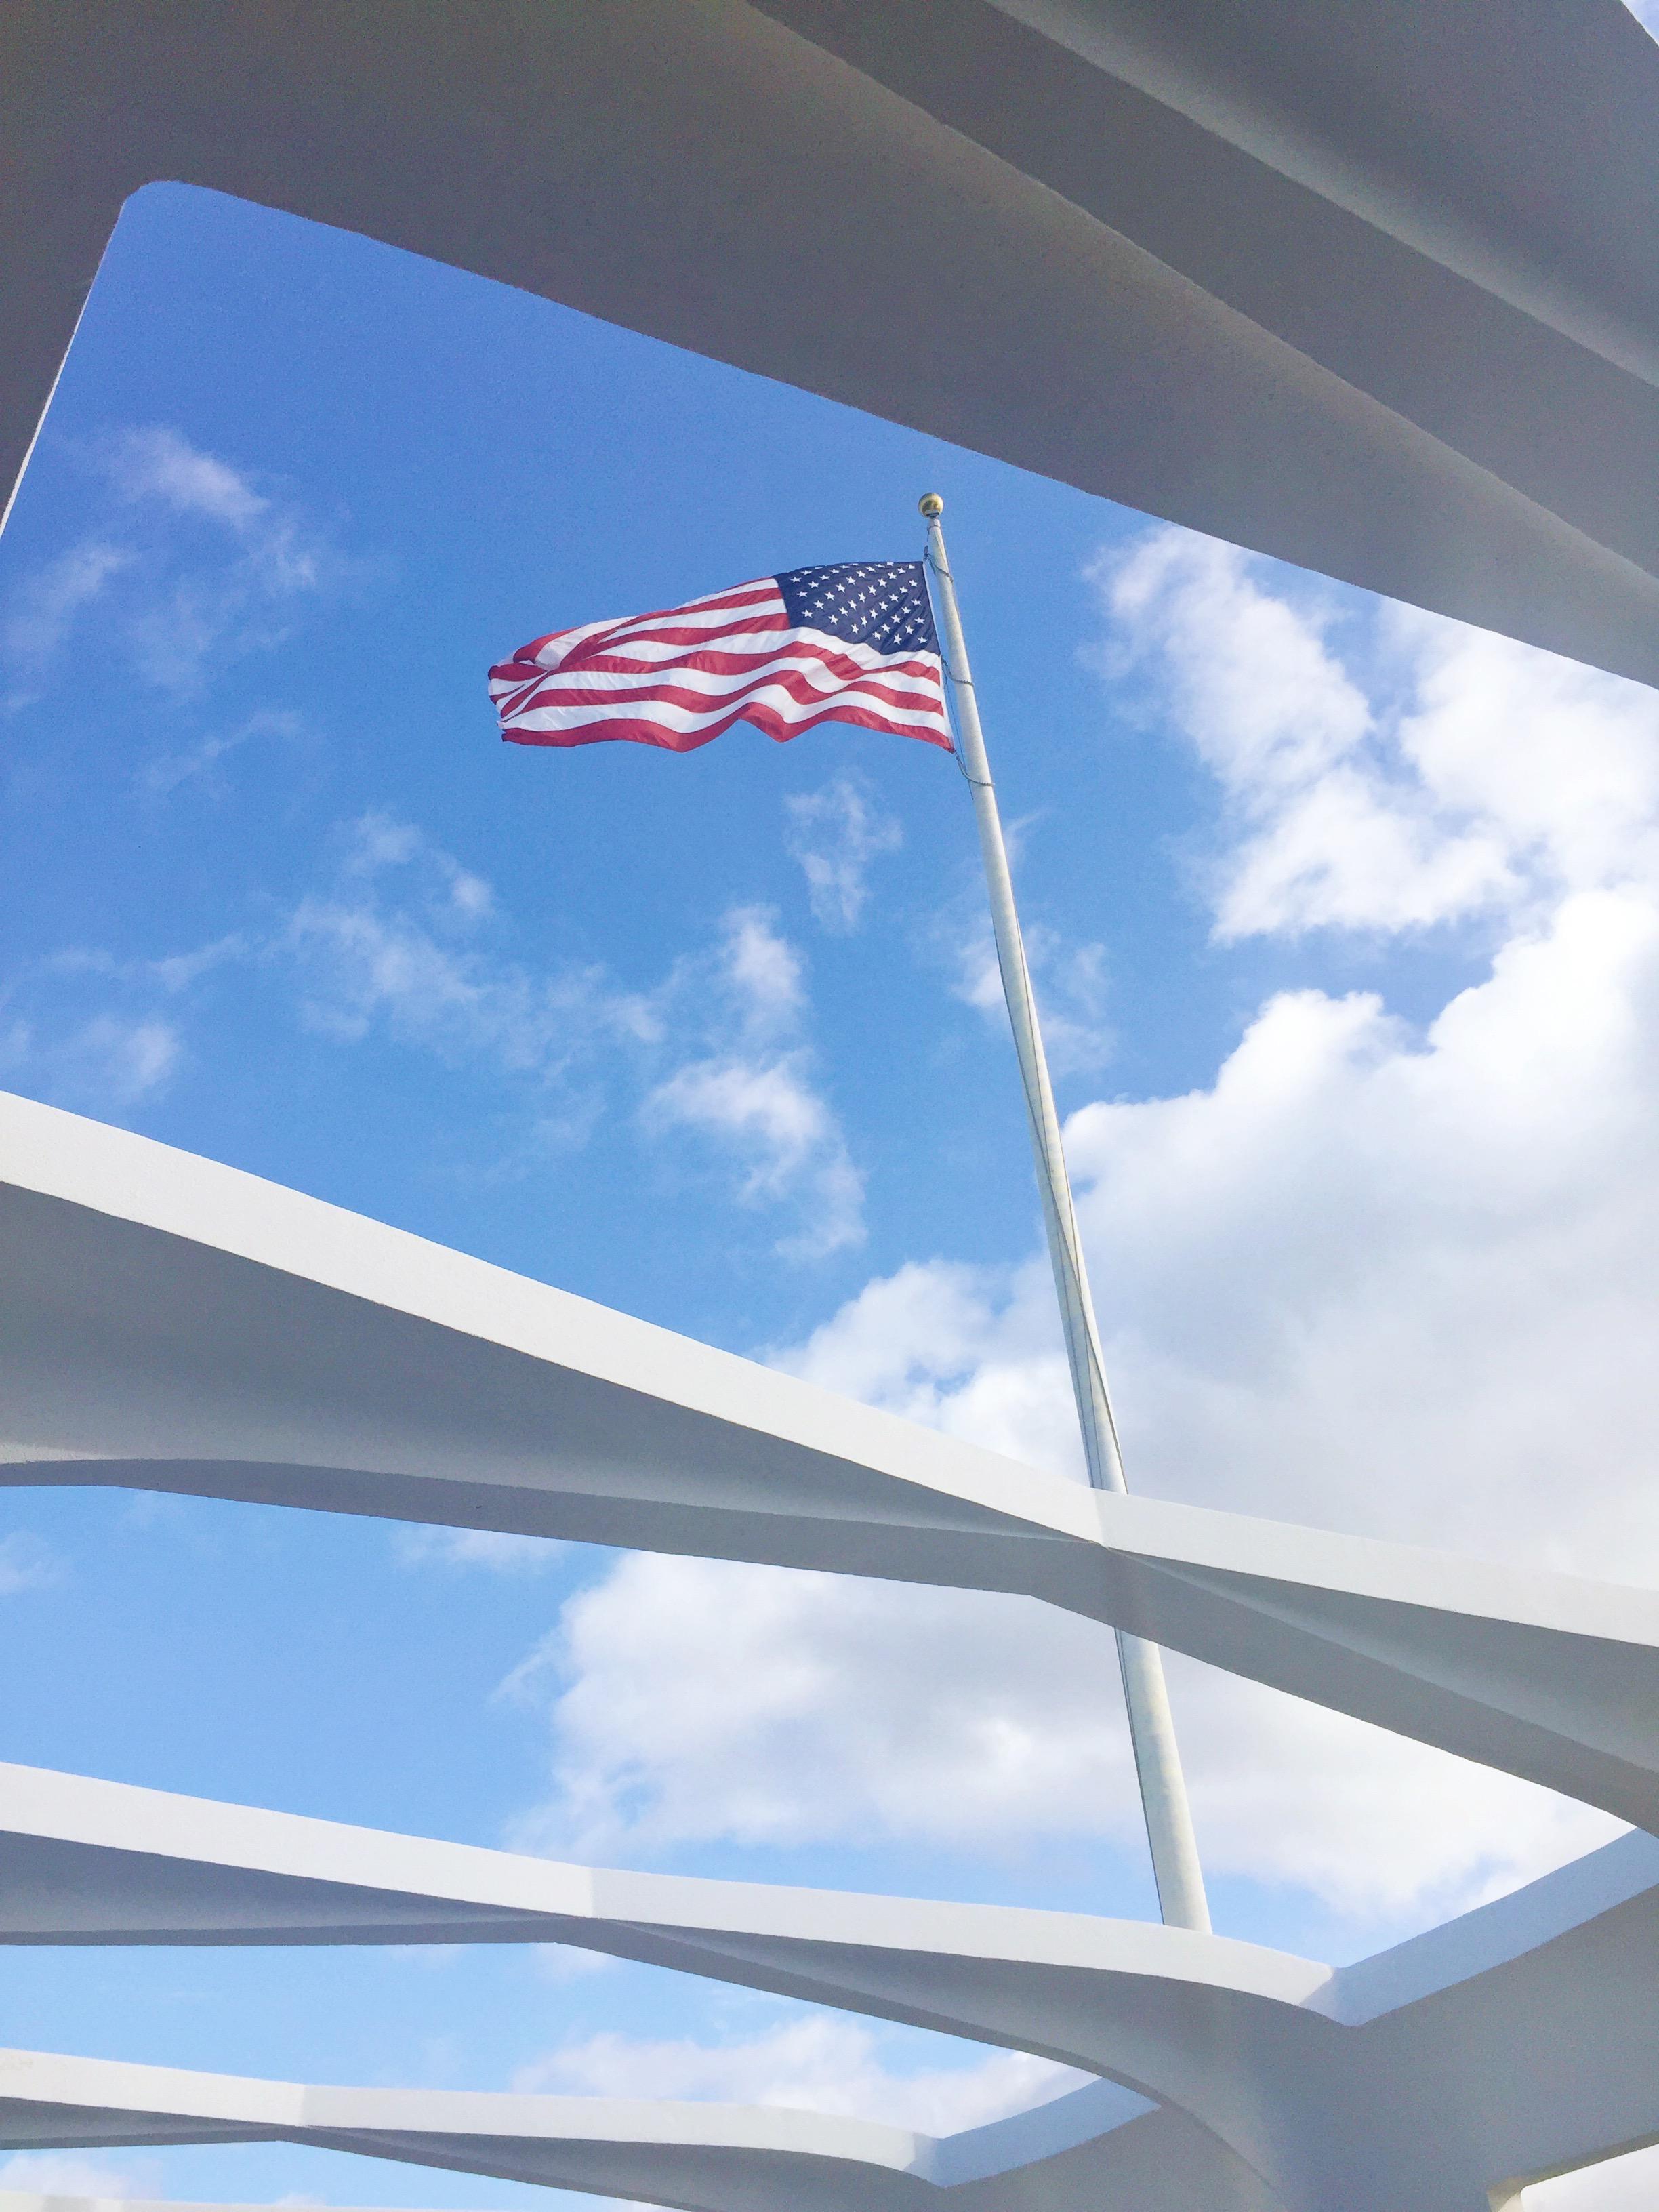 Pearl Harbor Memorial - USS Arizona - The Ultimate Hawaii Guide For Military Families - Hawaii Guide - Hawaii Must Do - Hawaii Itinerary - Oahu Itinerary - Maui - Kauai - Big Island Hawaii - Communikait by Kait Hanson